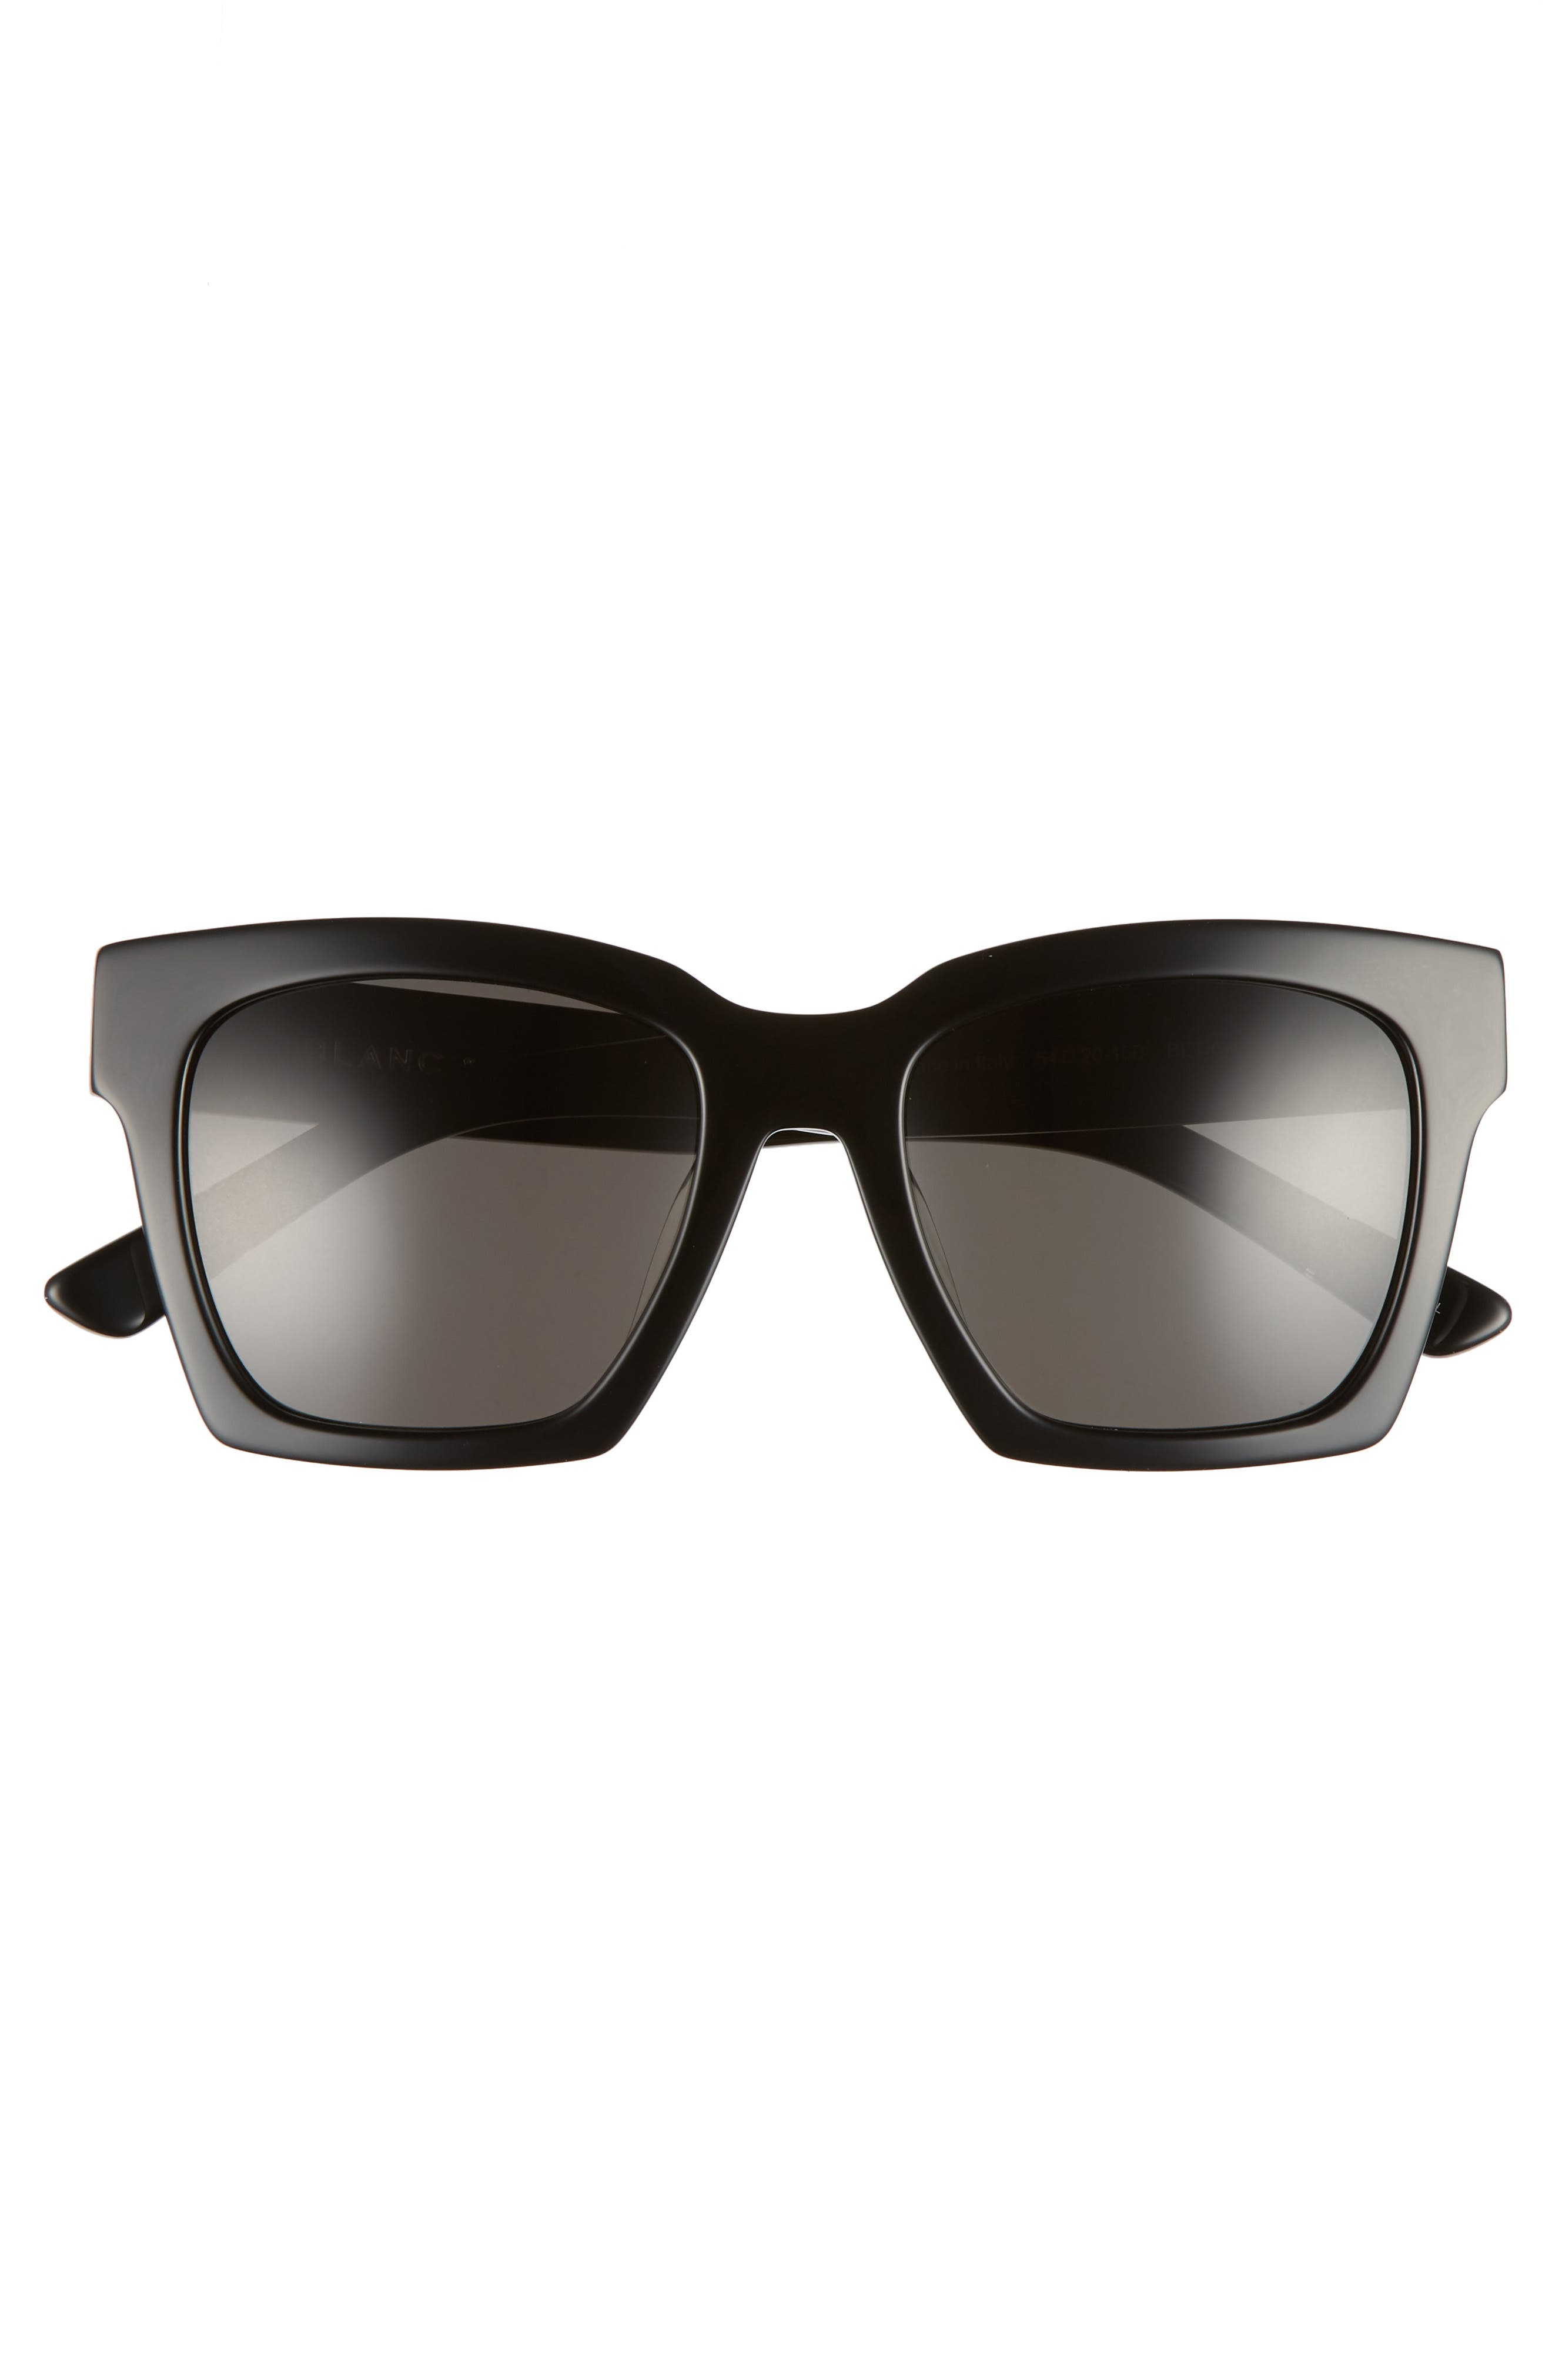 BLANC & ECLARE New York 54mm Polarized Sunglasses,                             Alternate thumbnail 3, color,                             BLACK